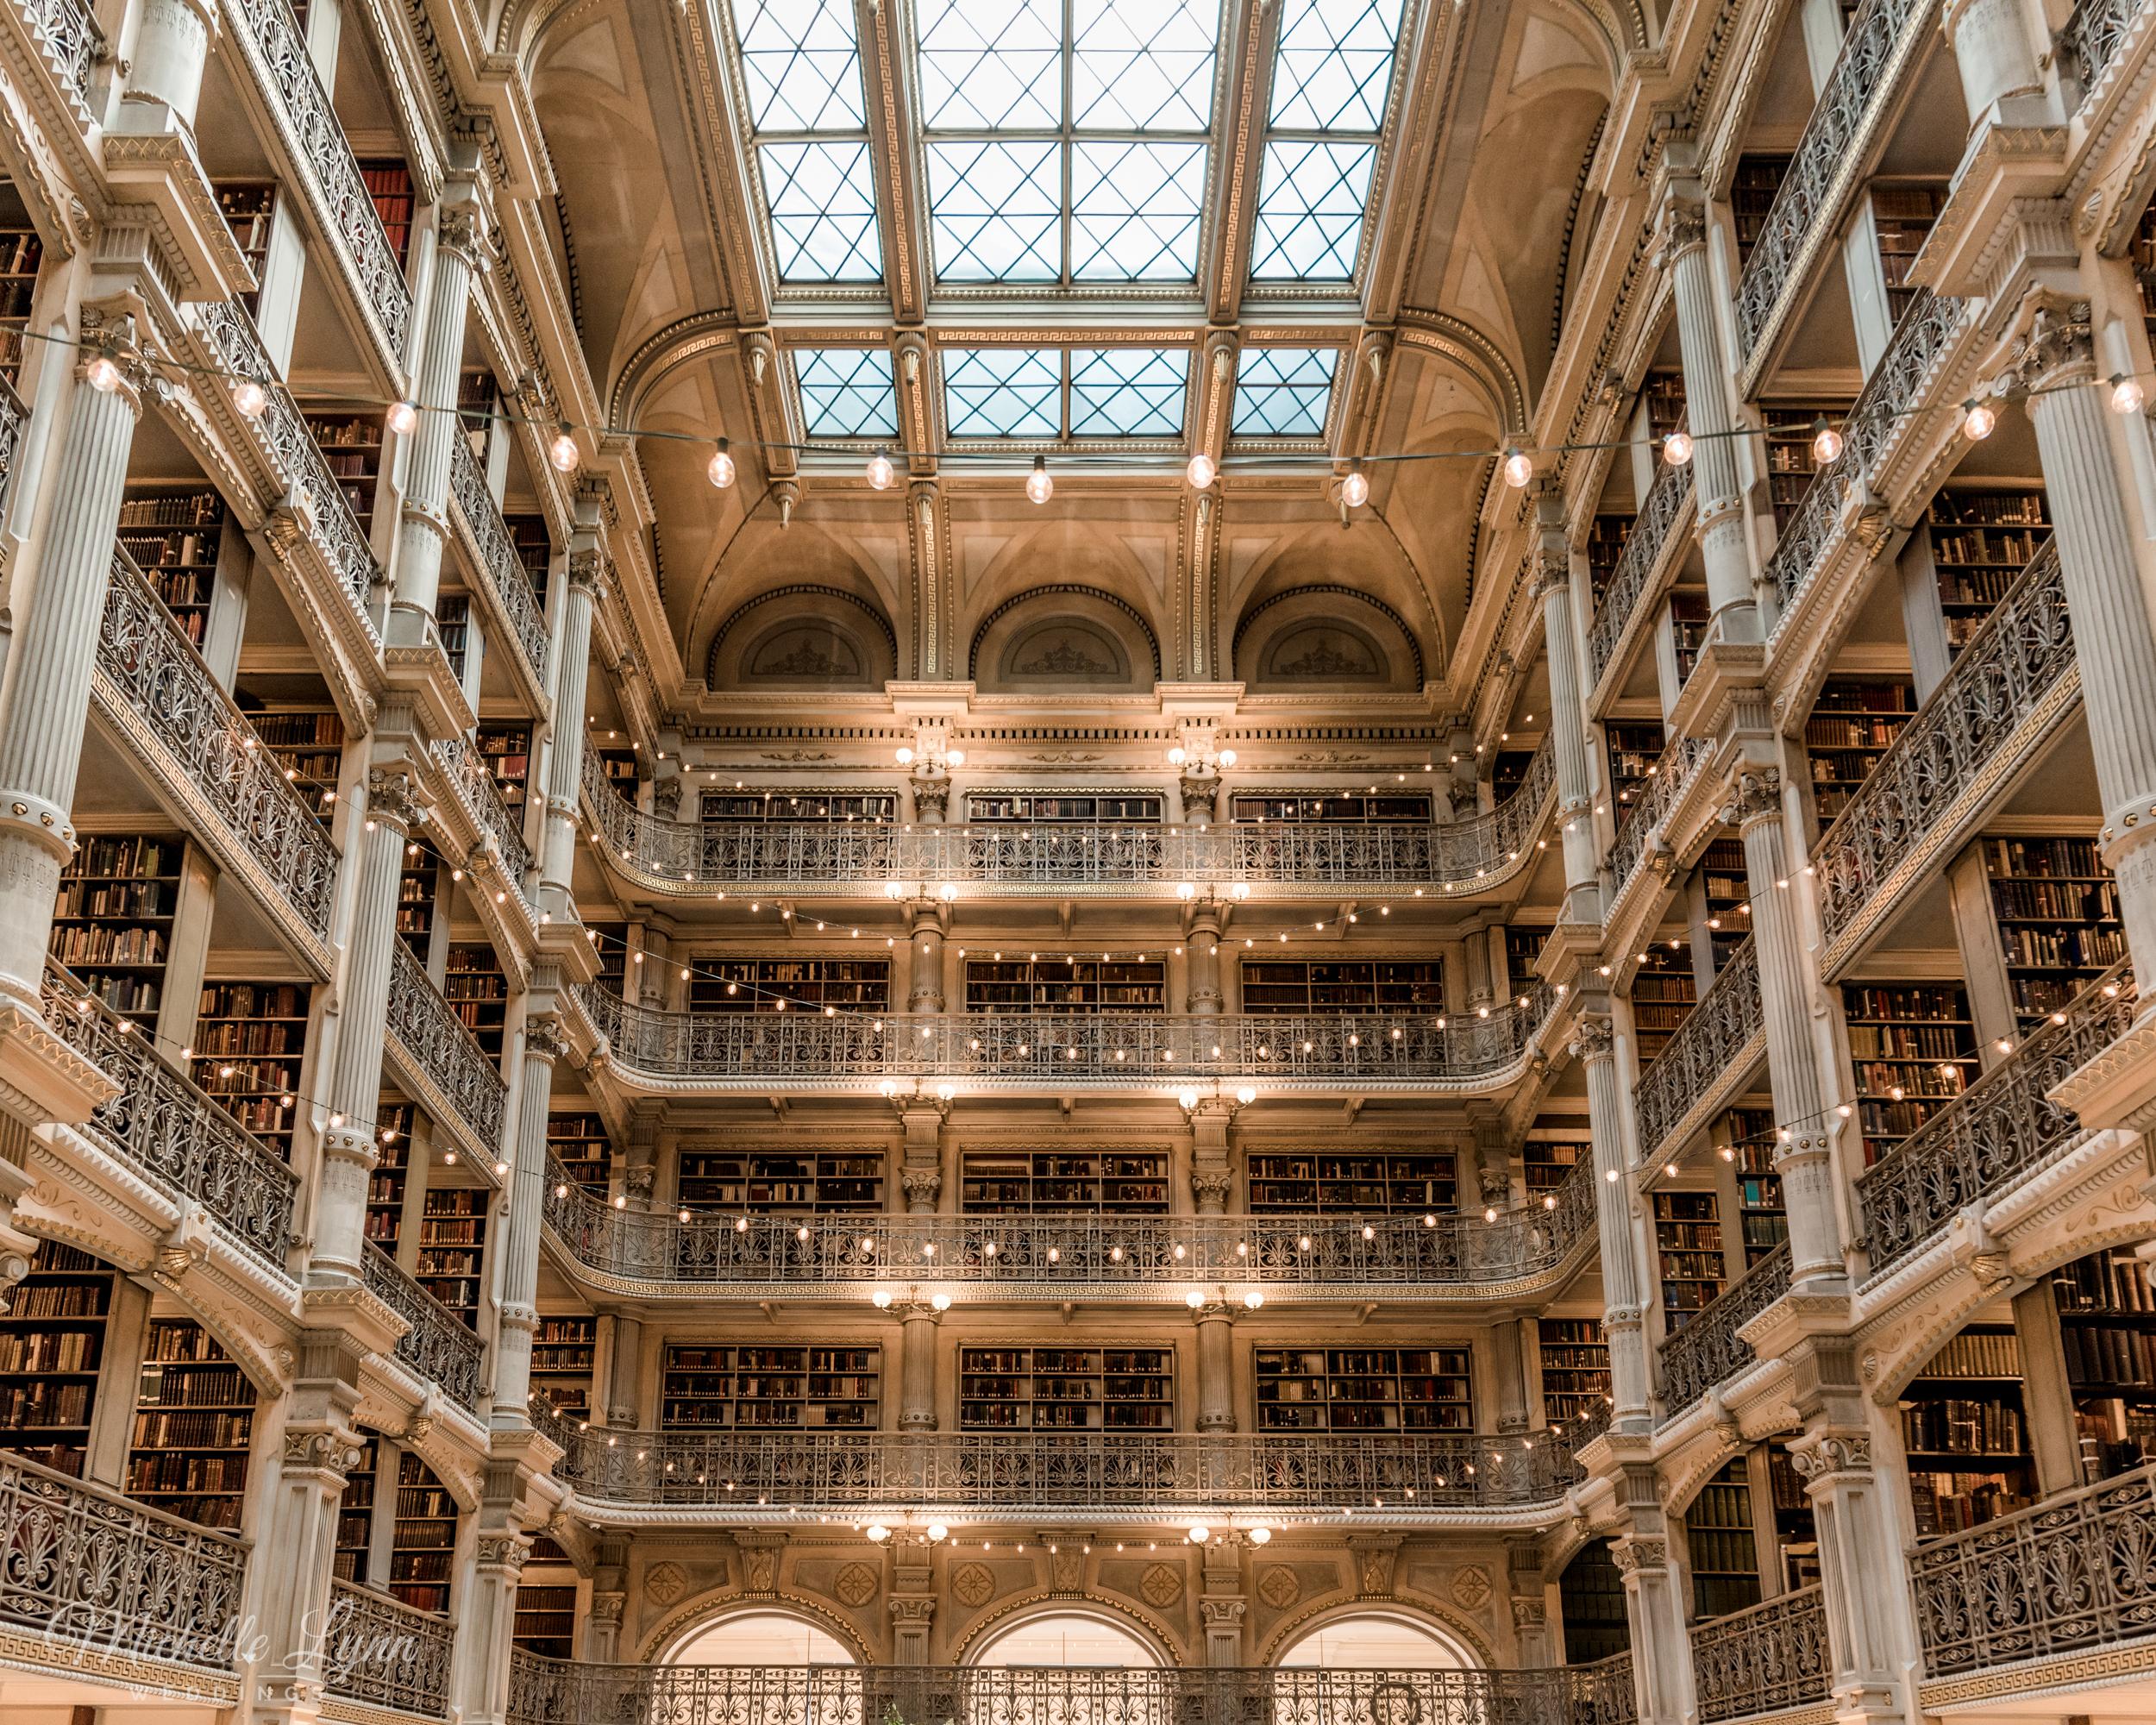 George_Peabody_Library-Wedding_Styled_Shoot-26.jpg